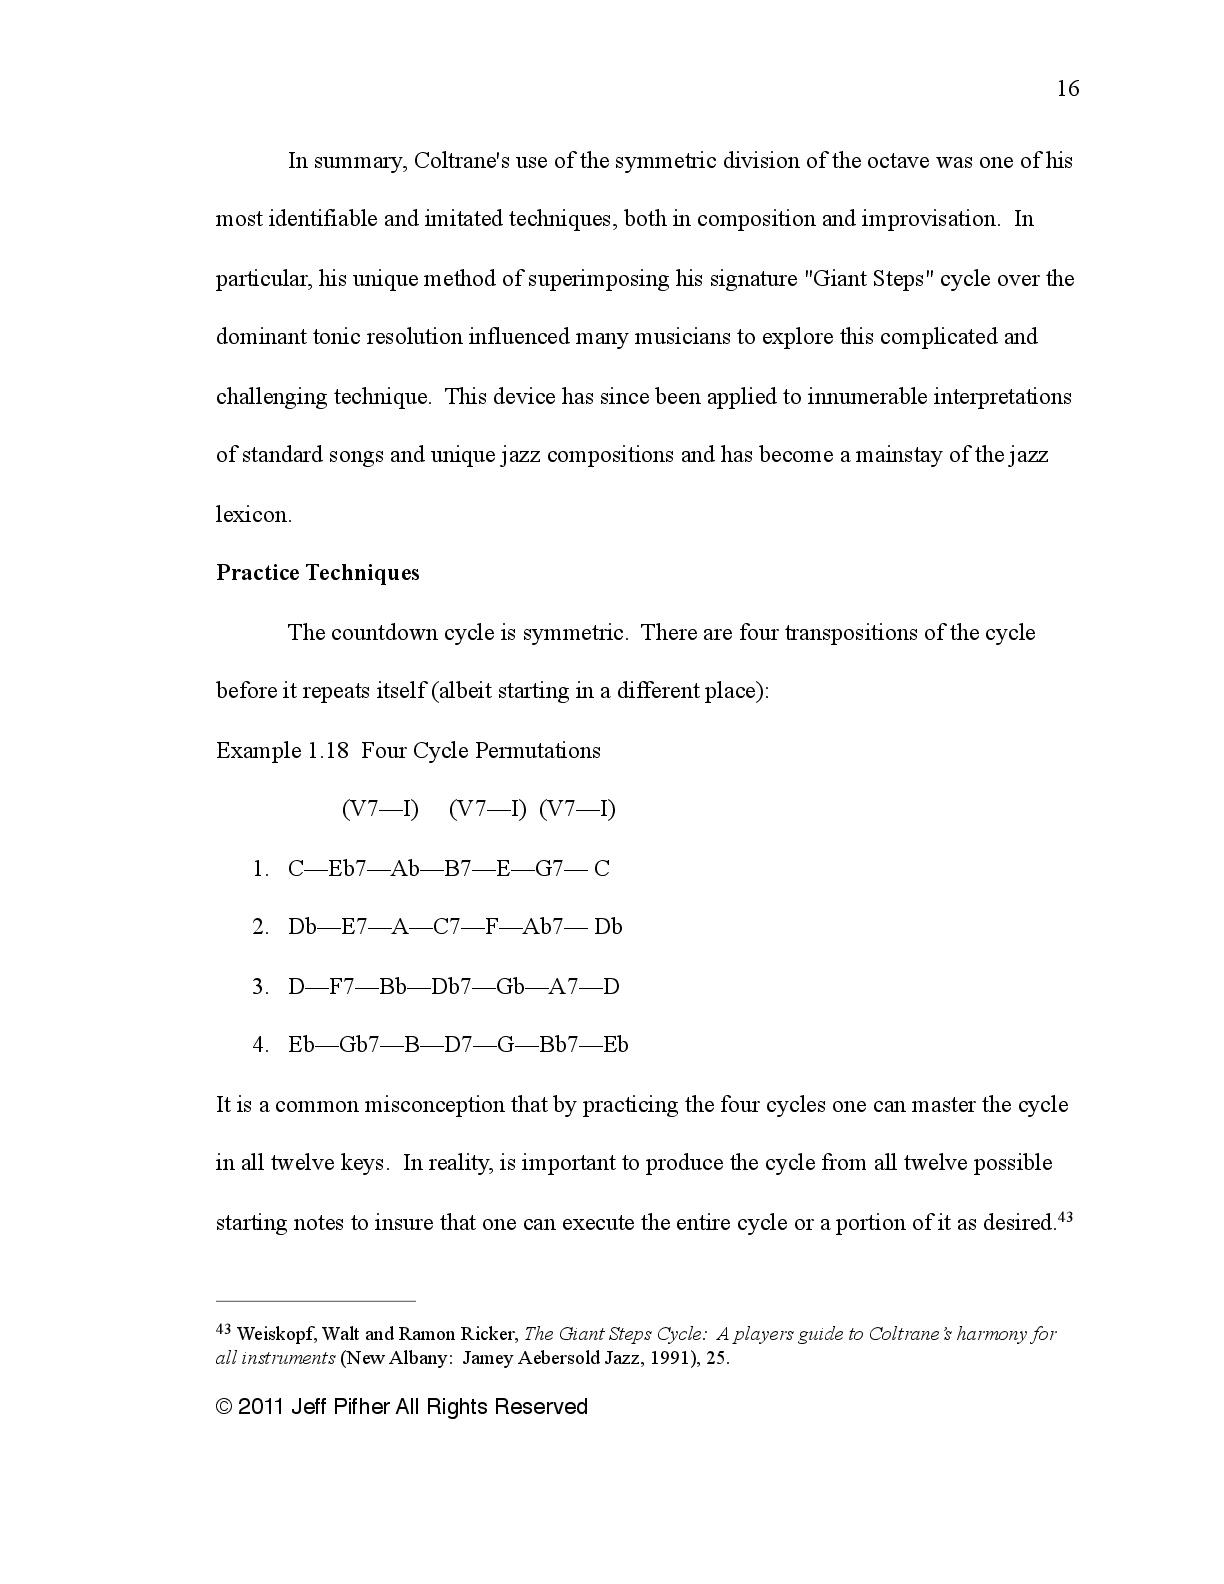 Jeff-Pifher-Academic-Series-Coltrane-Cycles-016.jpg